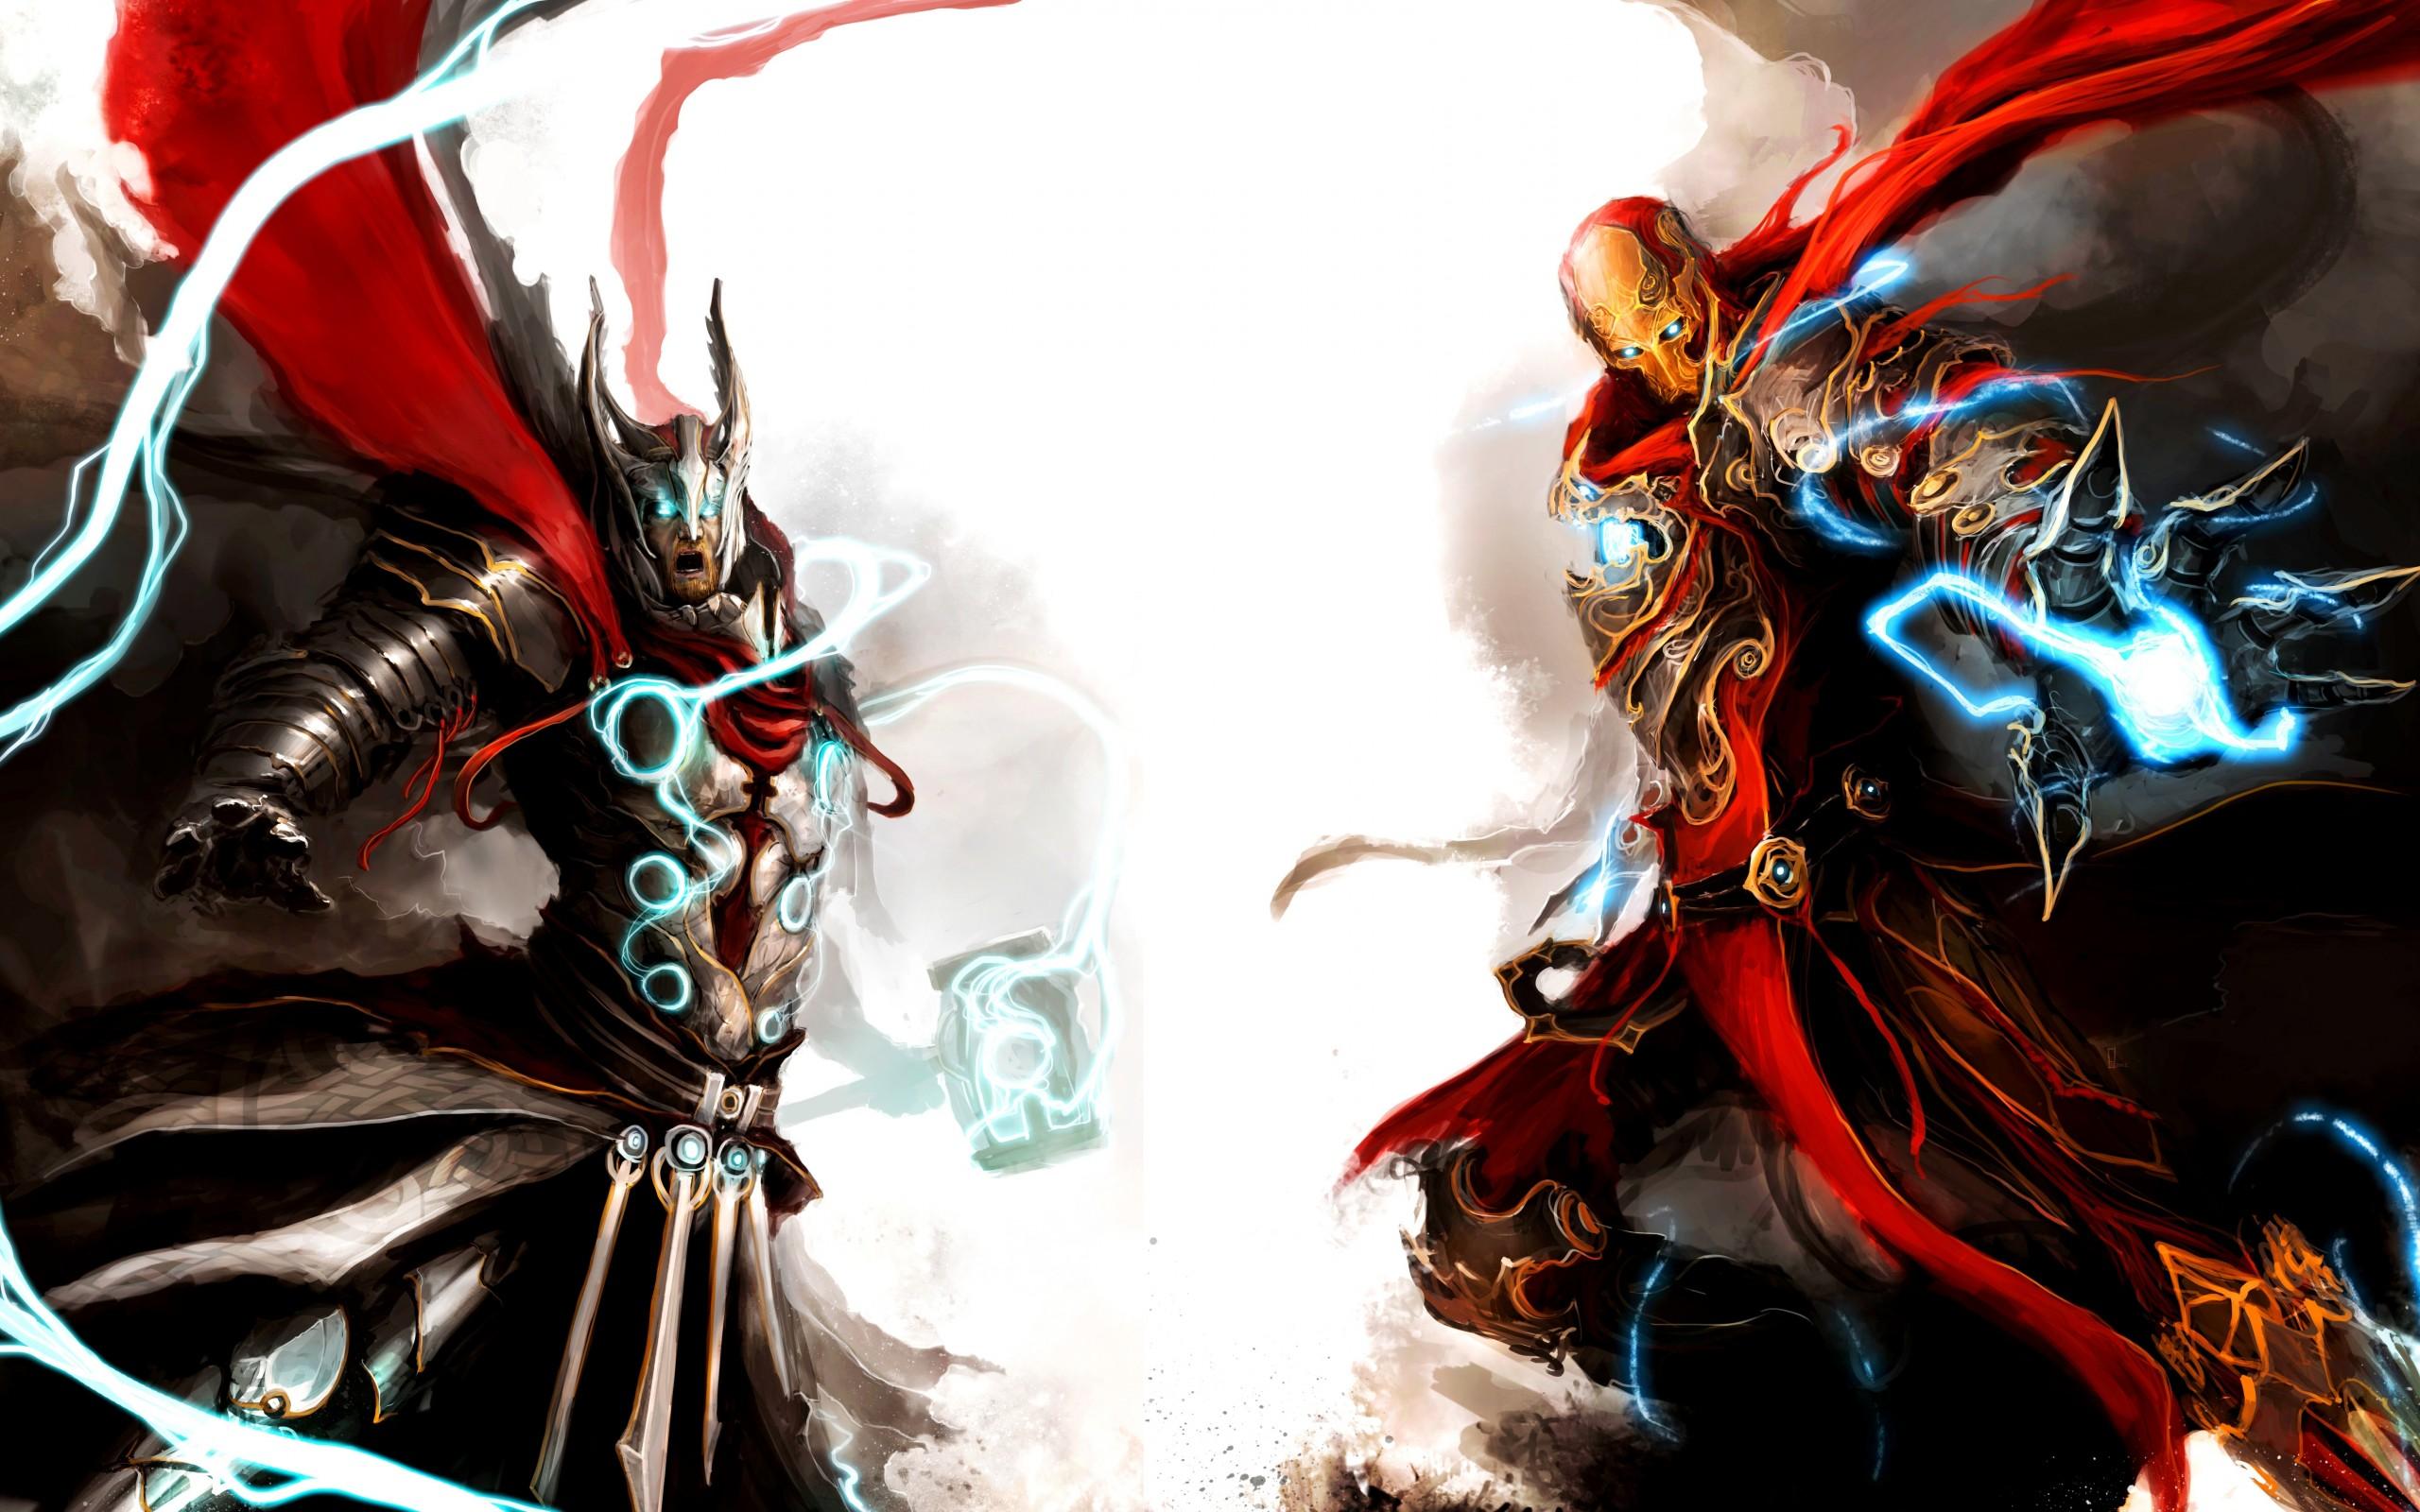 Marvel Avengers Desktop Wallpaper - WallpaperSafari